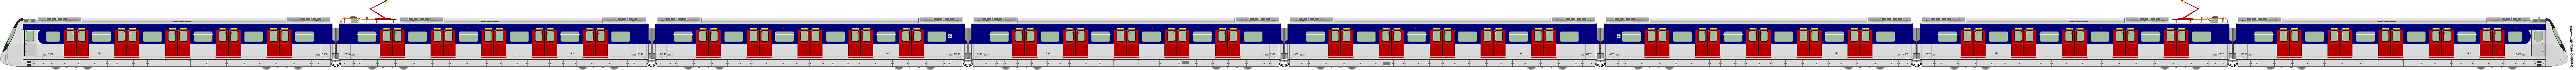 Train 5549